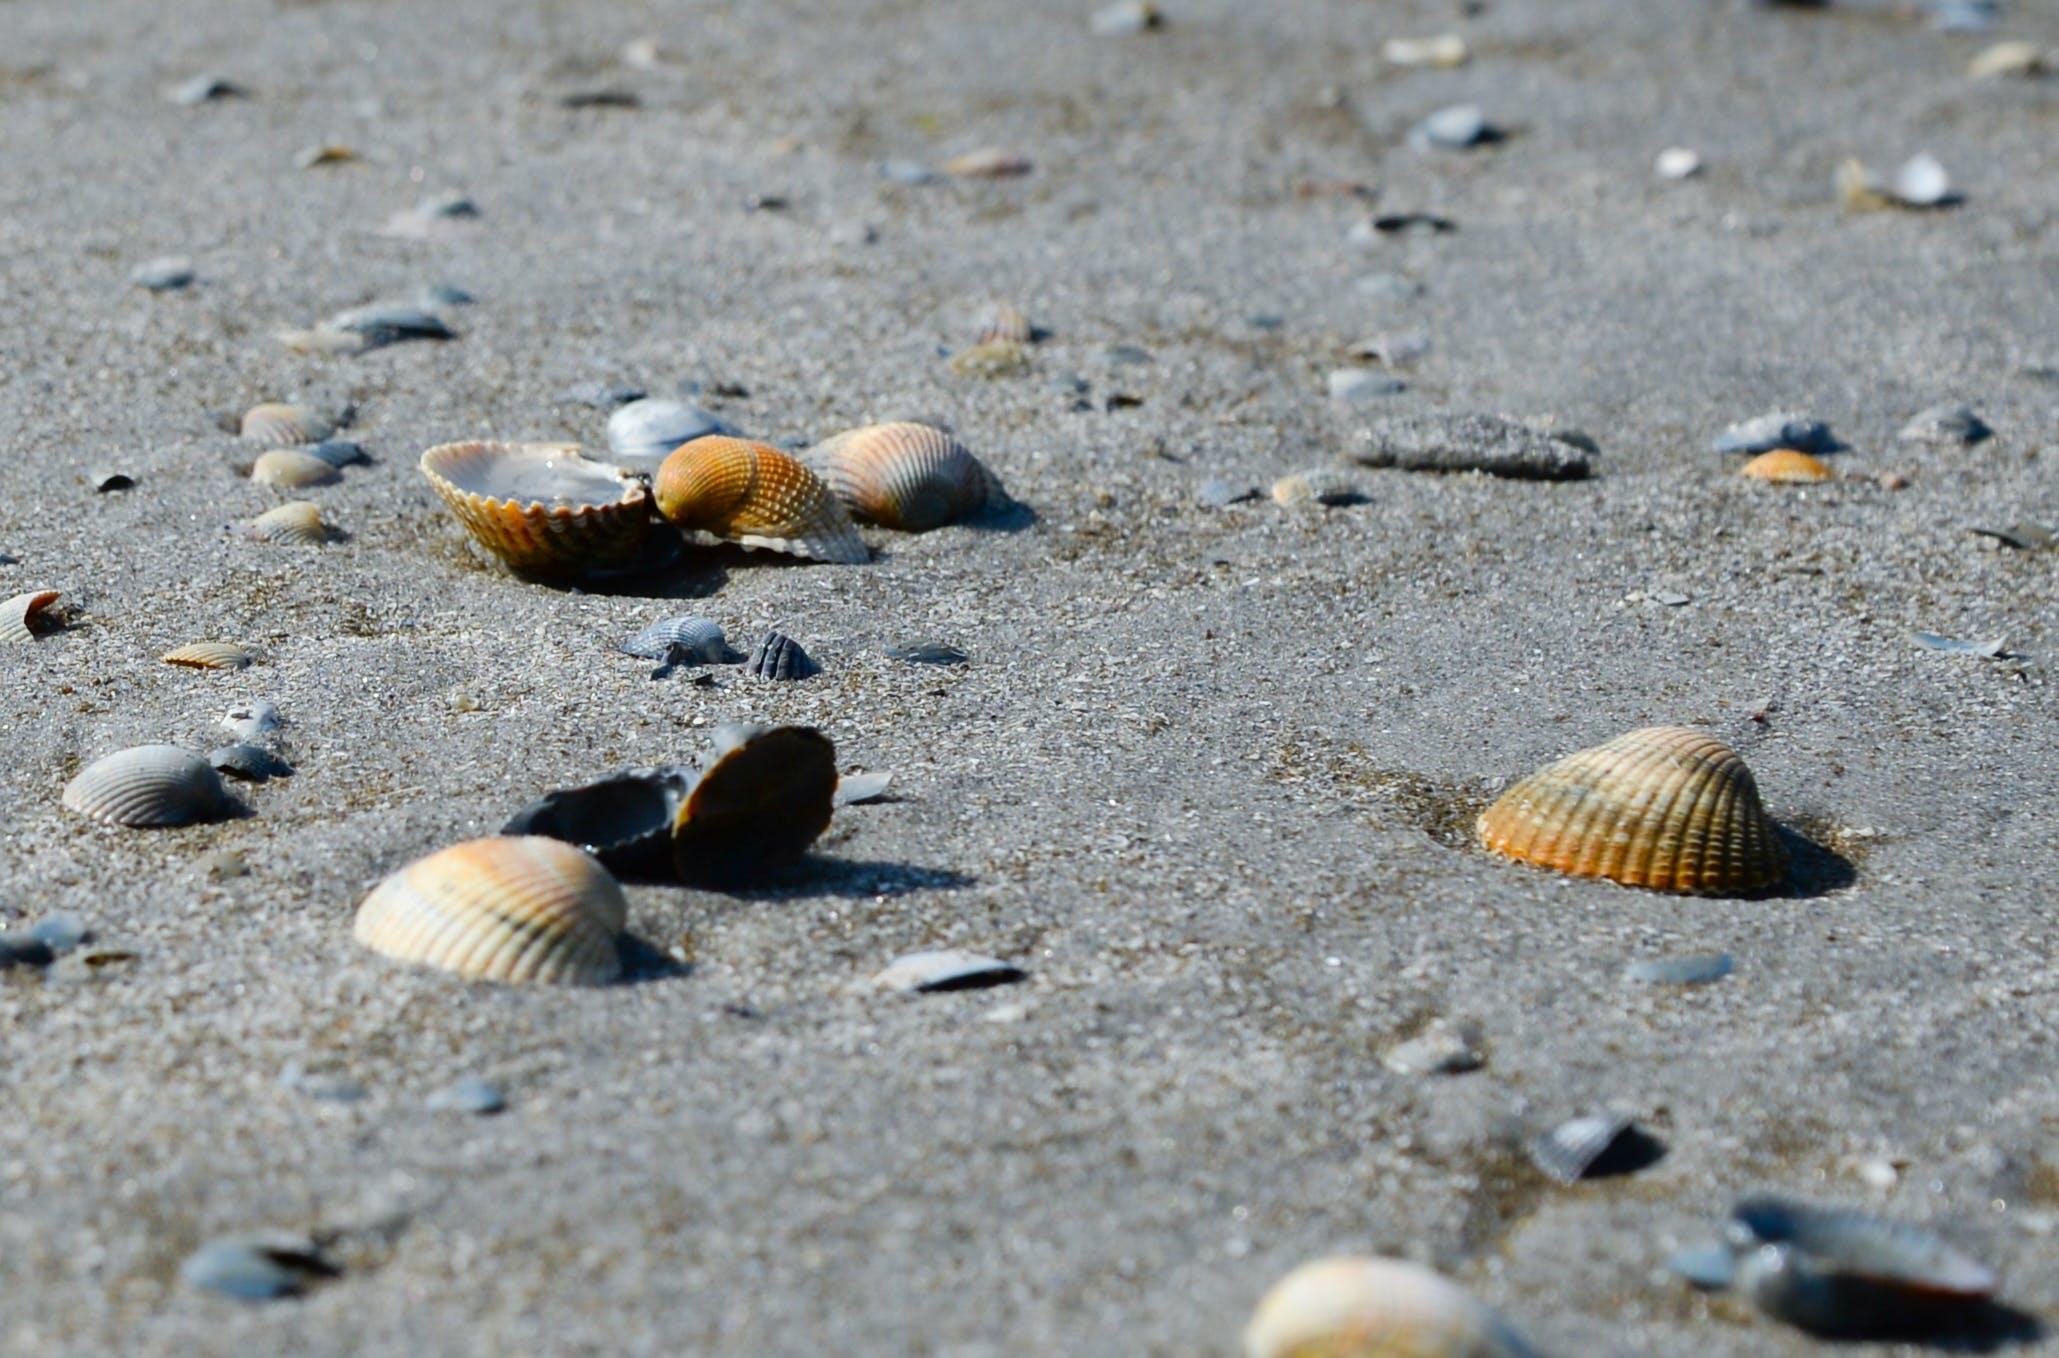 Close-up Photo of Seashells